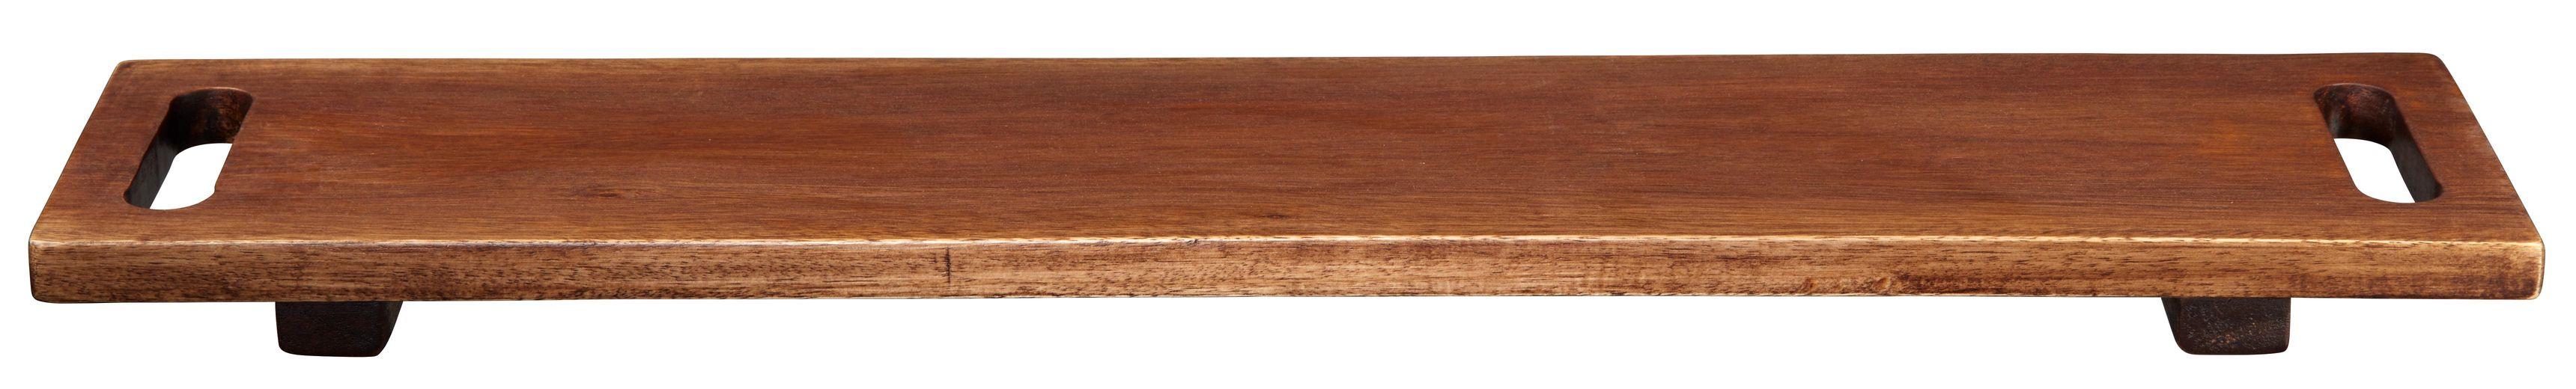 ASA Selection Serveerplank Wood